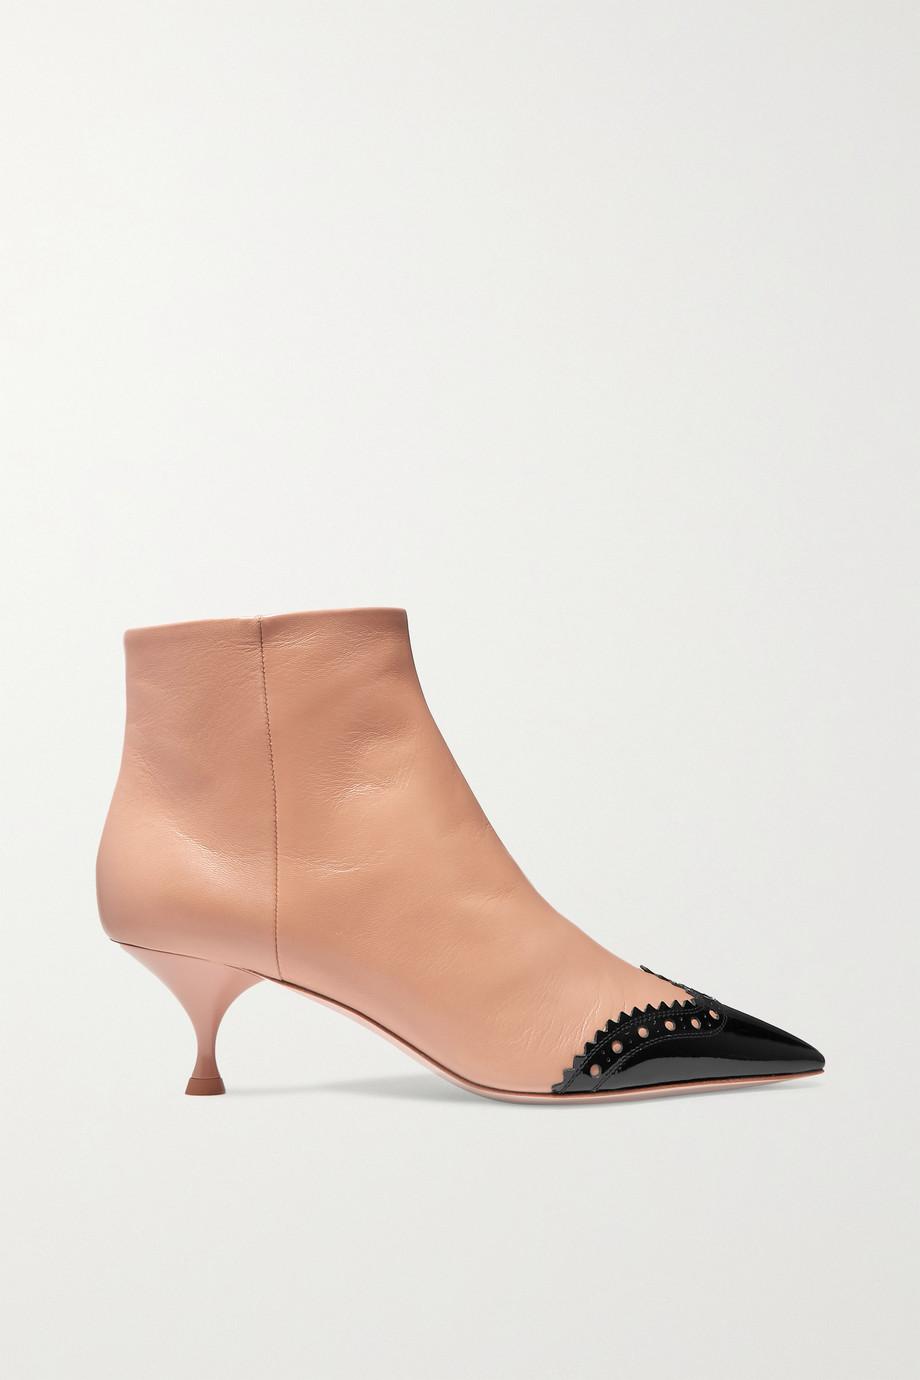 Miu Miu Two-tone leather ankle boots